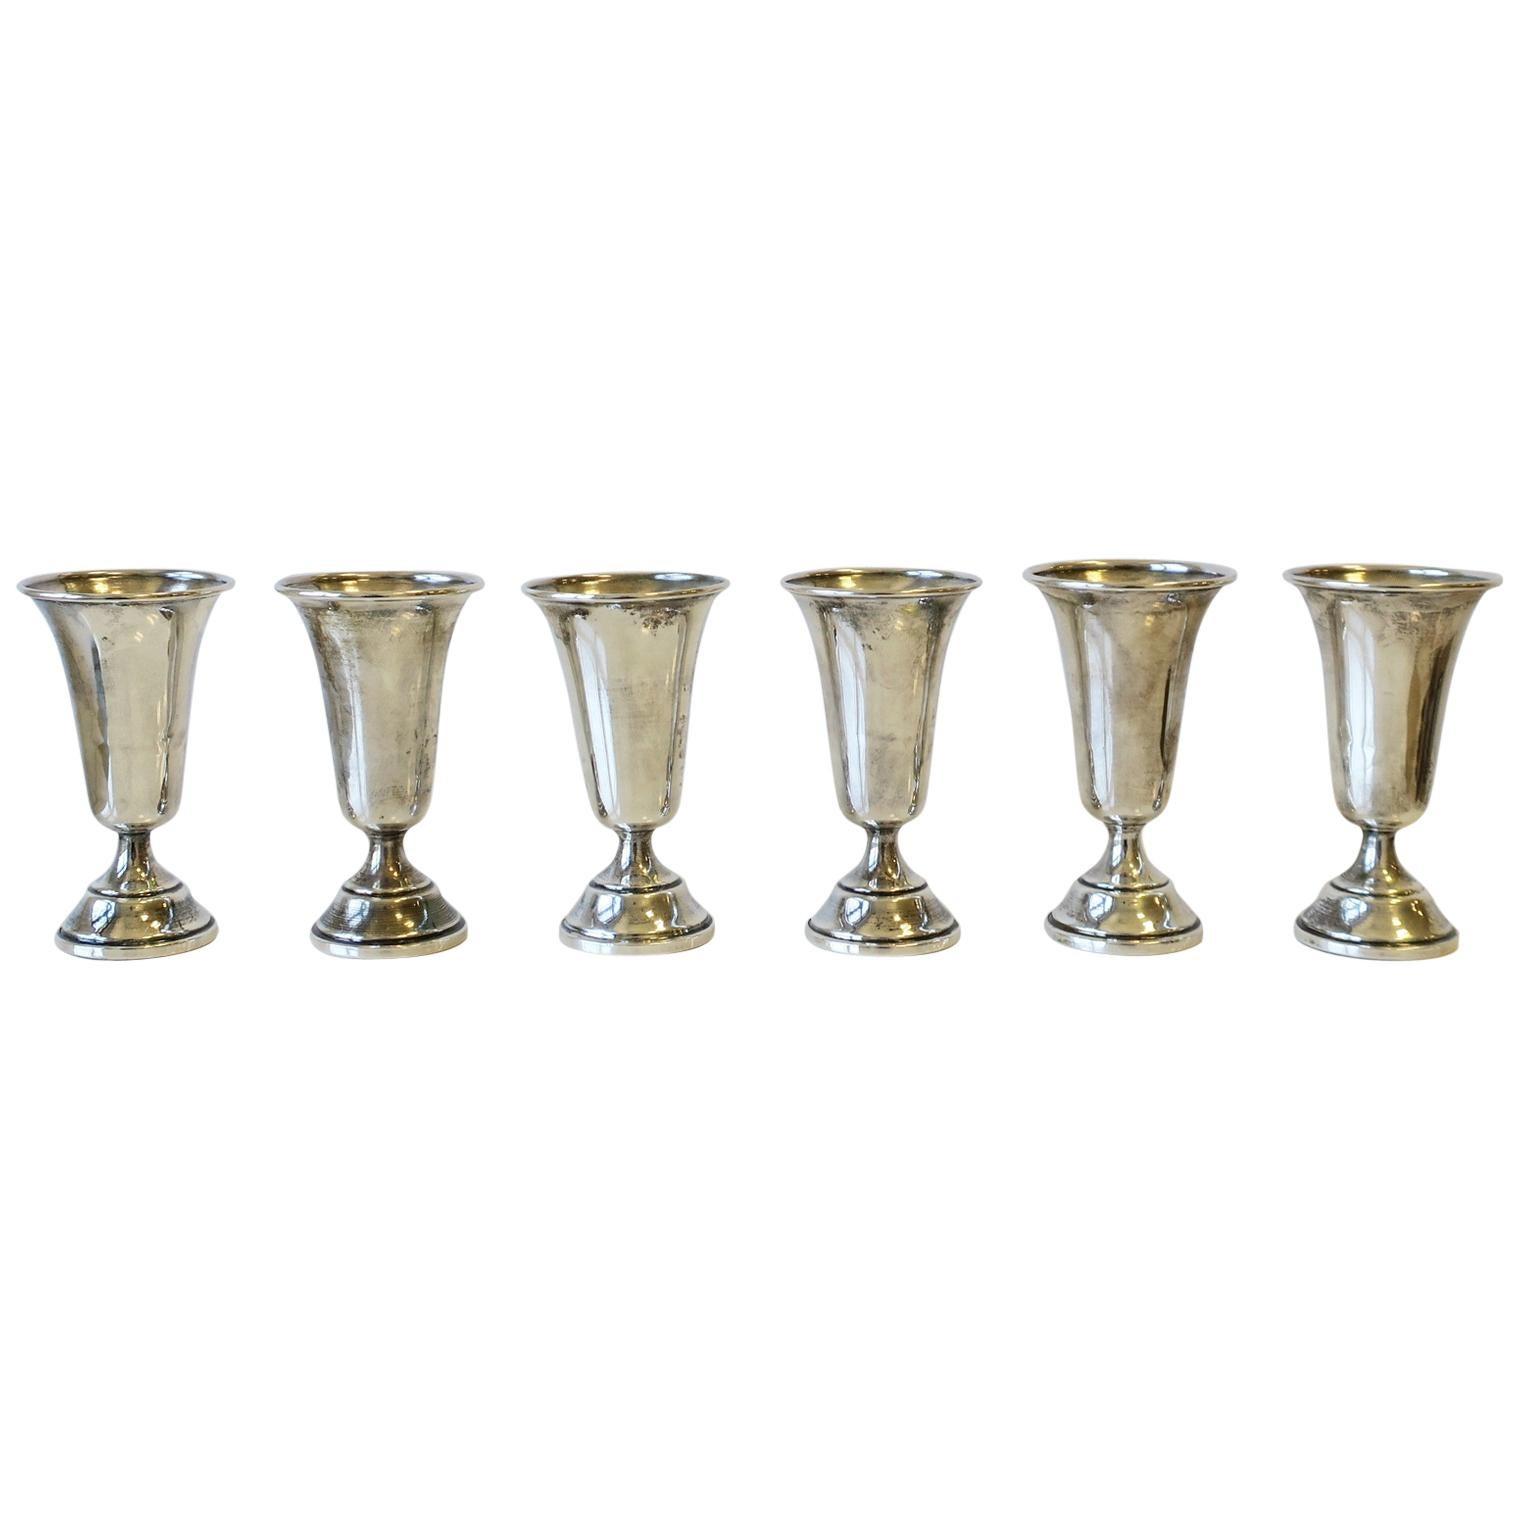 Sterling Silver Aperitif Liquor Cups or Vodka Shot Glasses, Set of 6